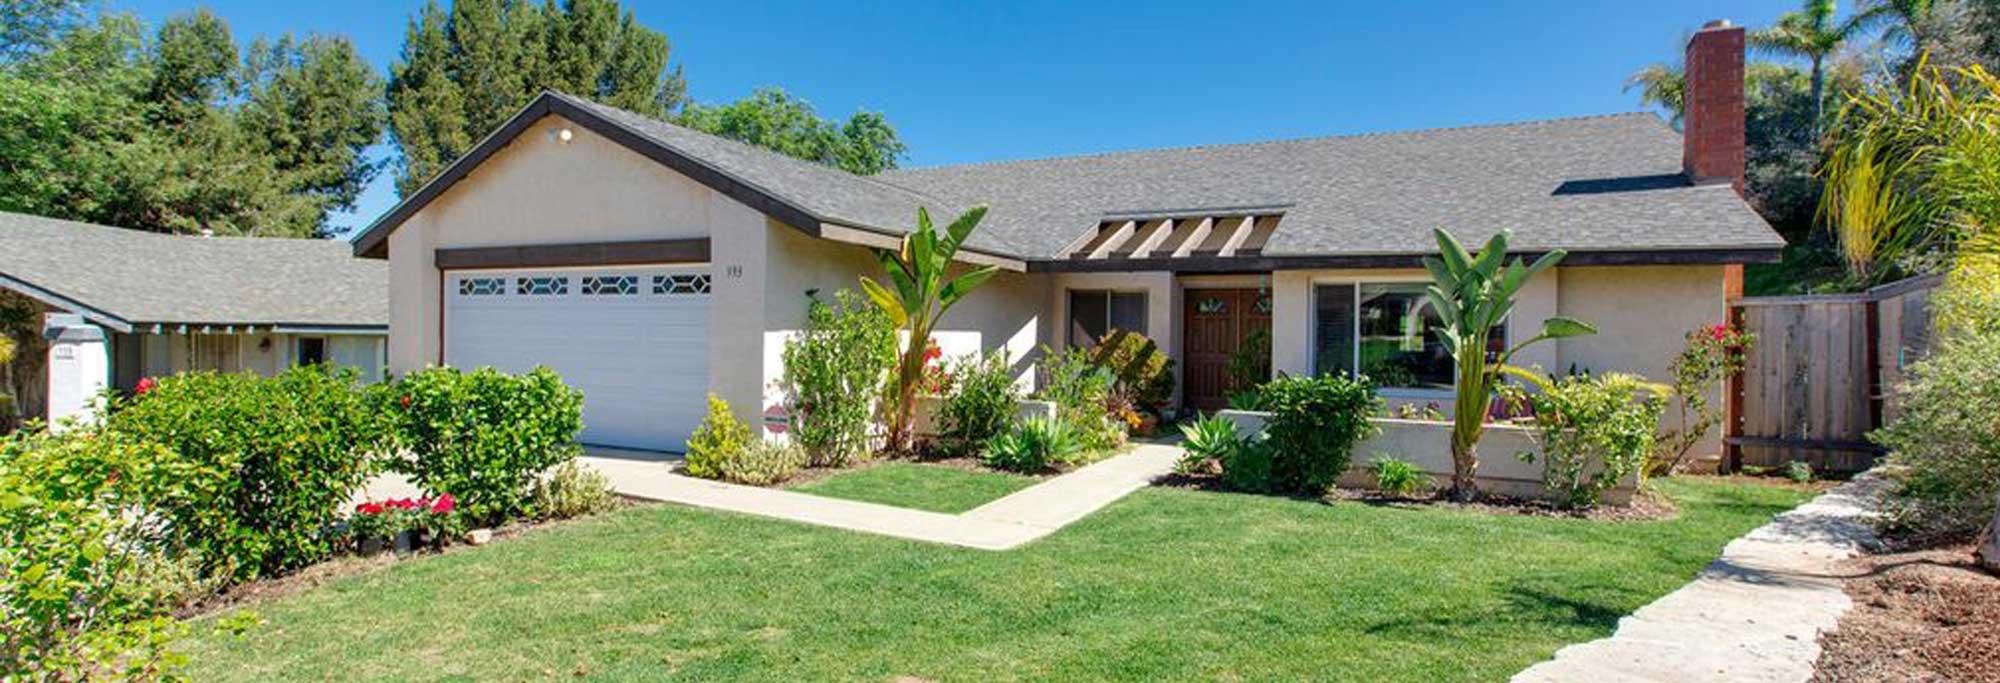 333 Camino Redondo, San Marcos, CA 92069 (MLS # 170015799)